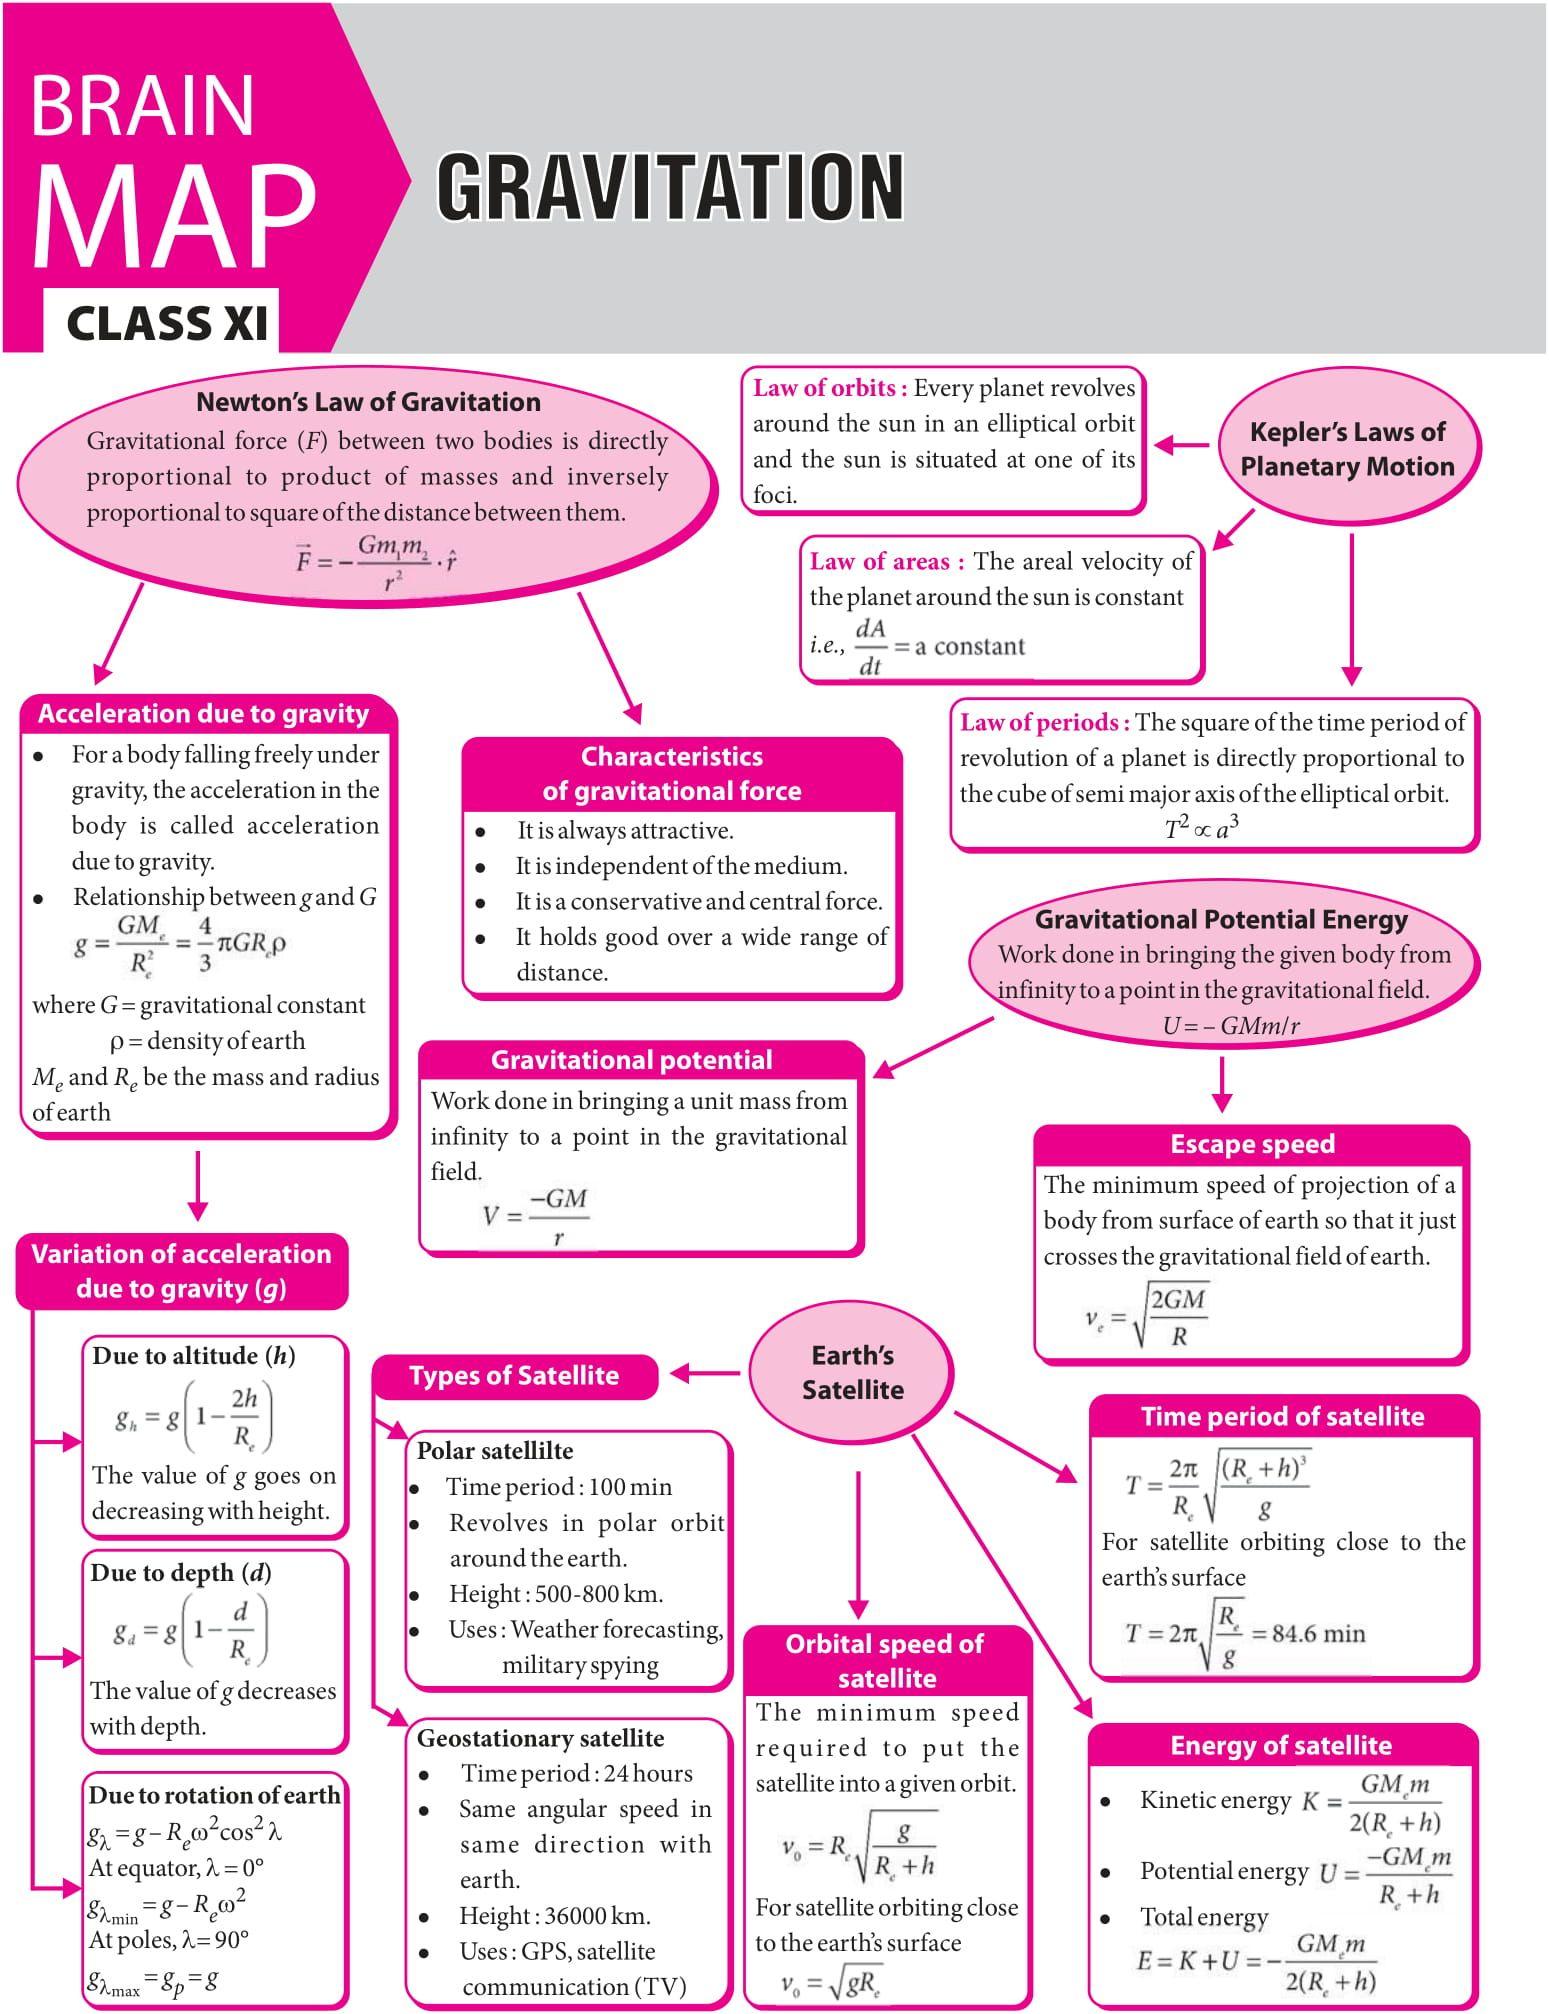 Gravitation Concept Map Mtg Physics For You Magazine Jeemain Jeeadvanced Class11 Classxi Physics And Mathematics Basic Physics Physics Lessons